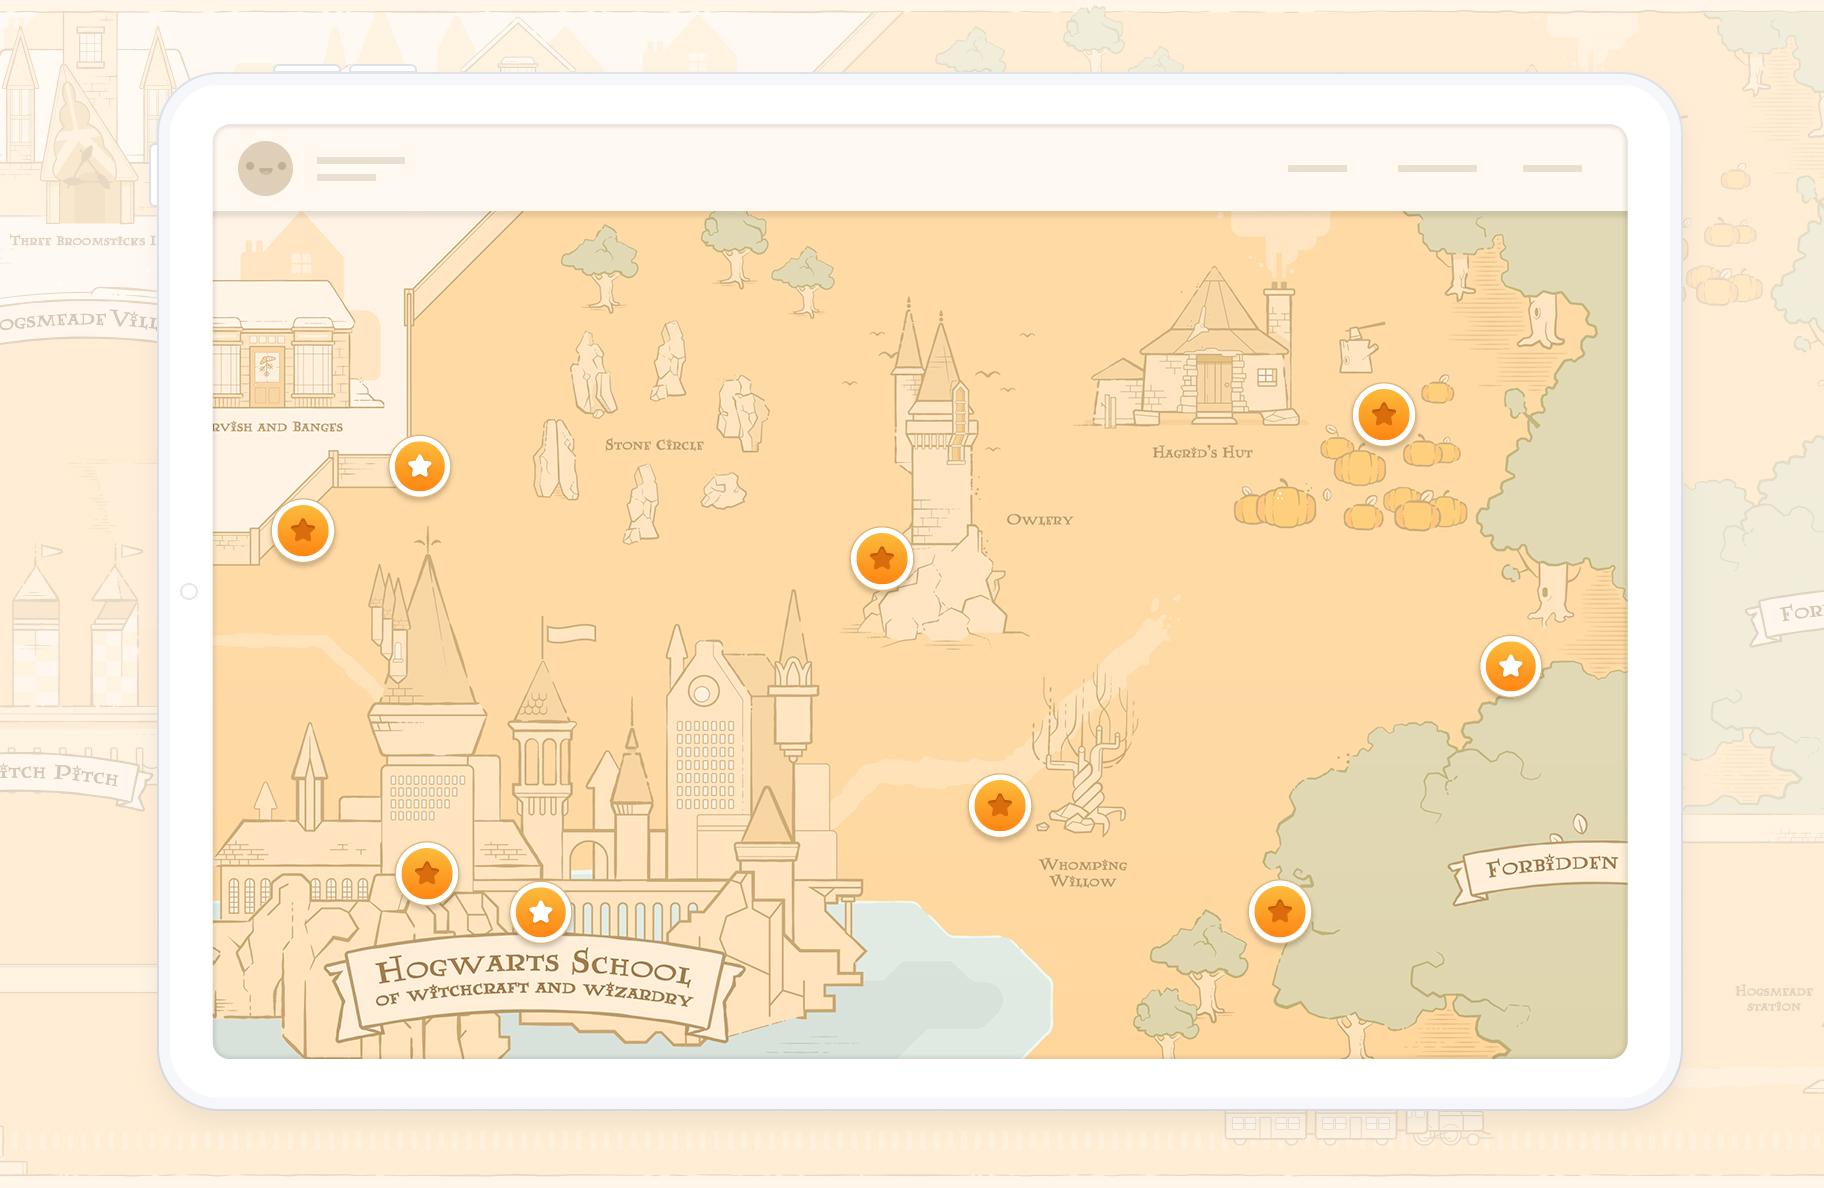 HP_IPAD_MAP_02.jpg